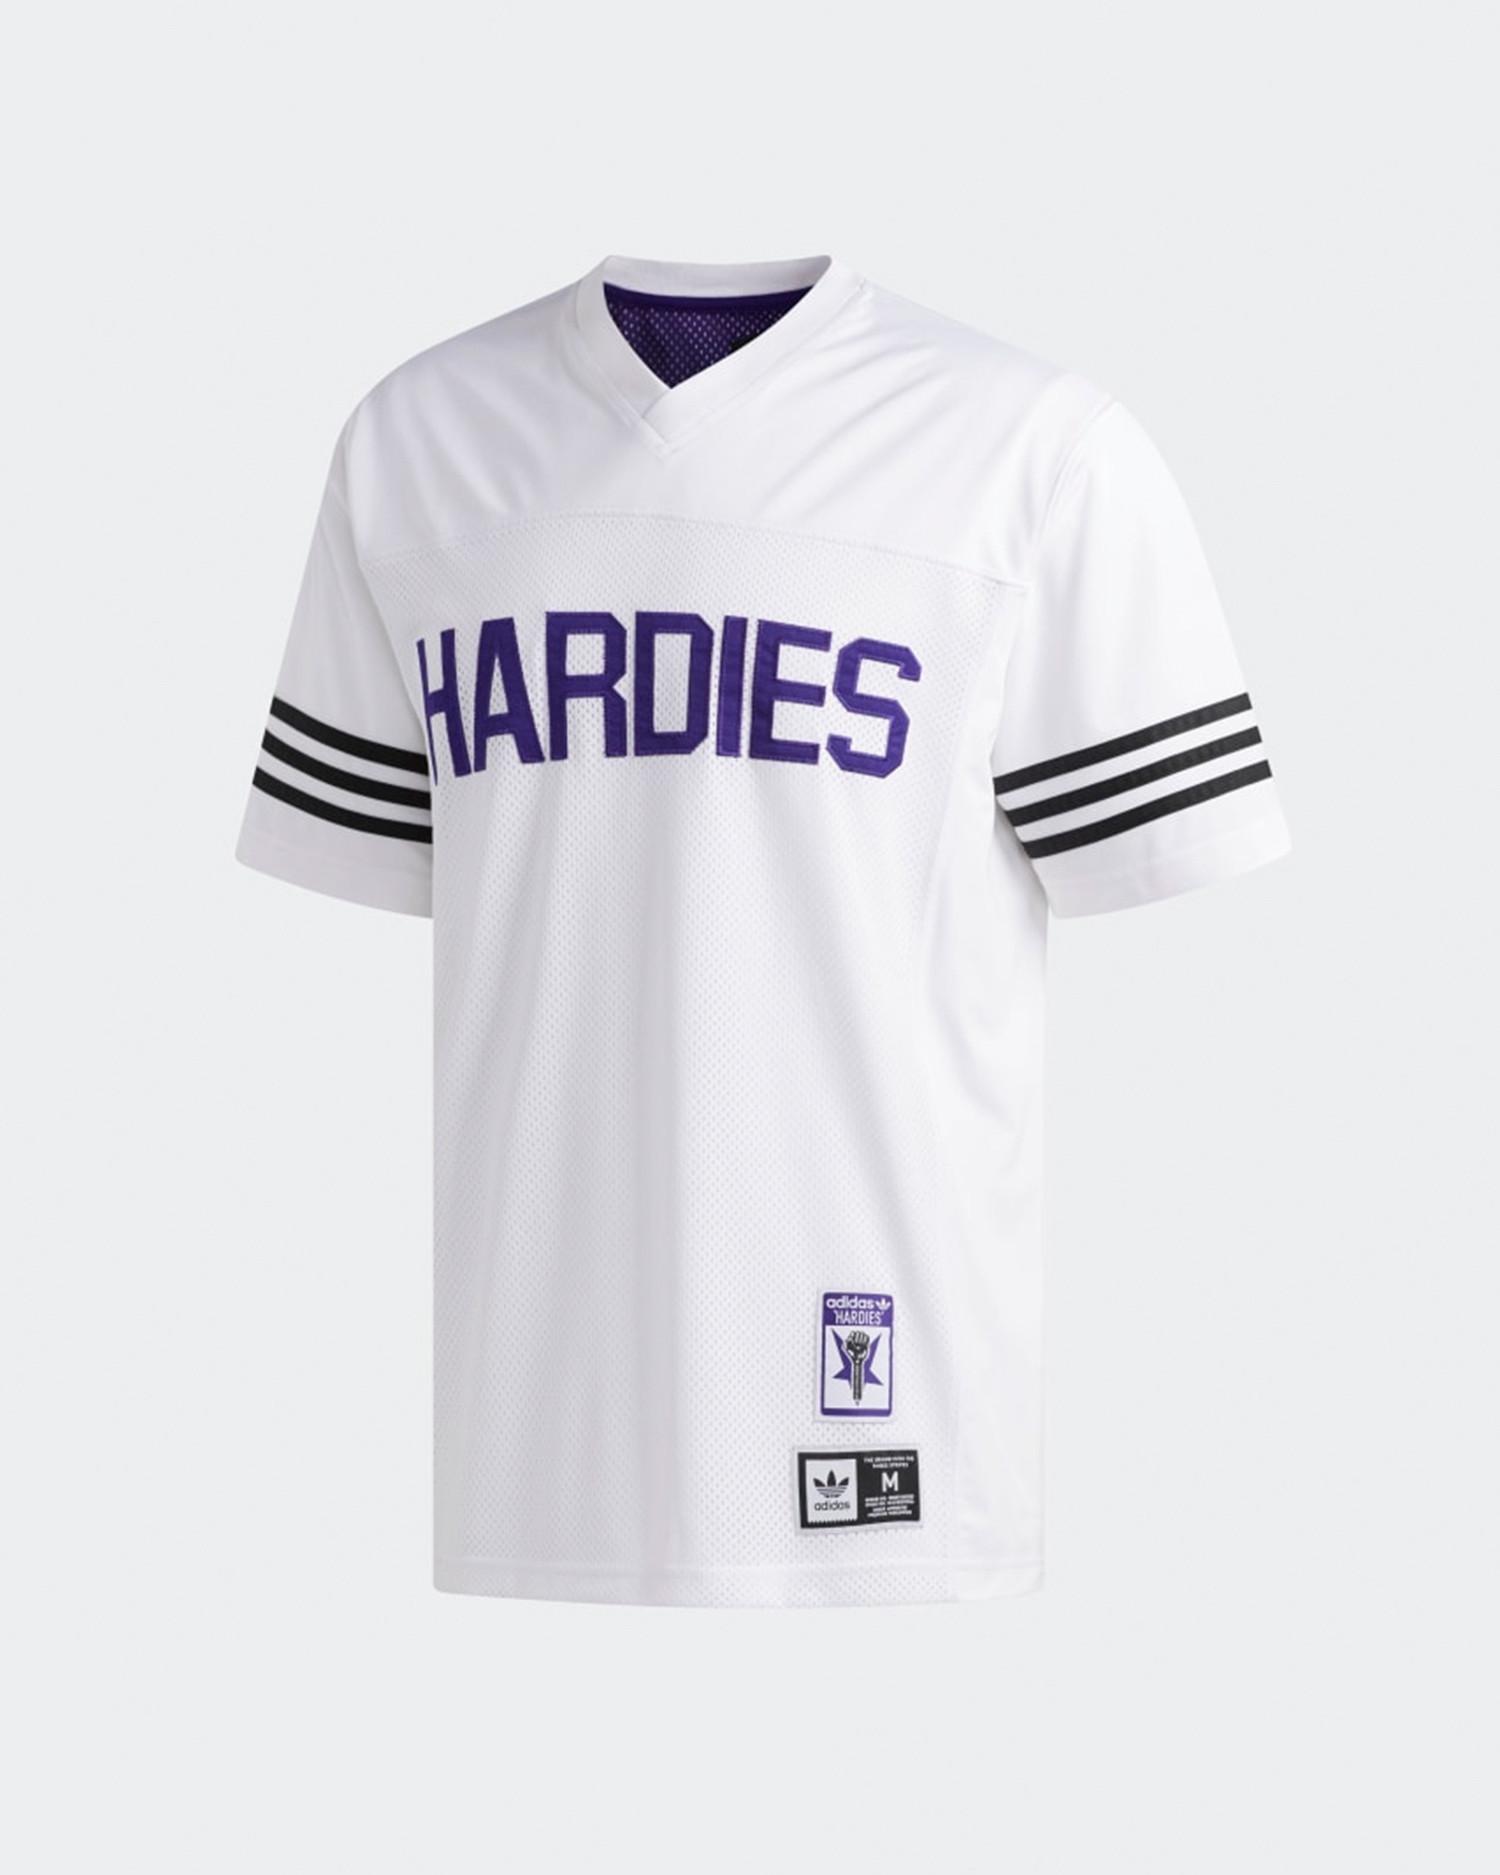 Adidas X Hardies Jersey             white/cpurpl/black